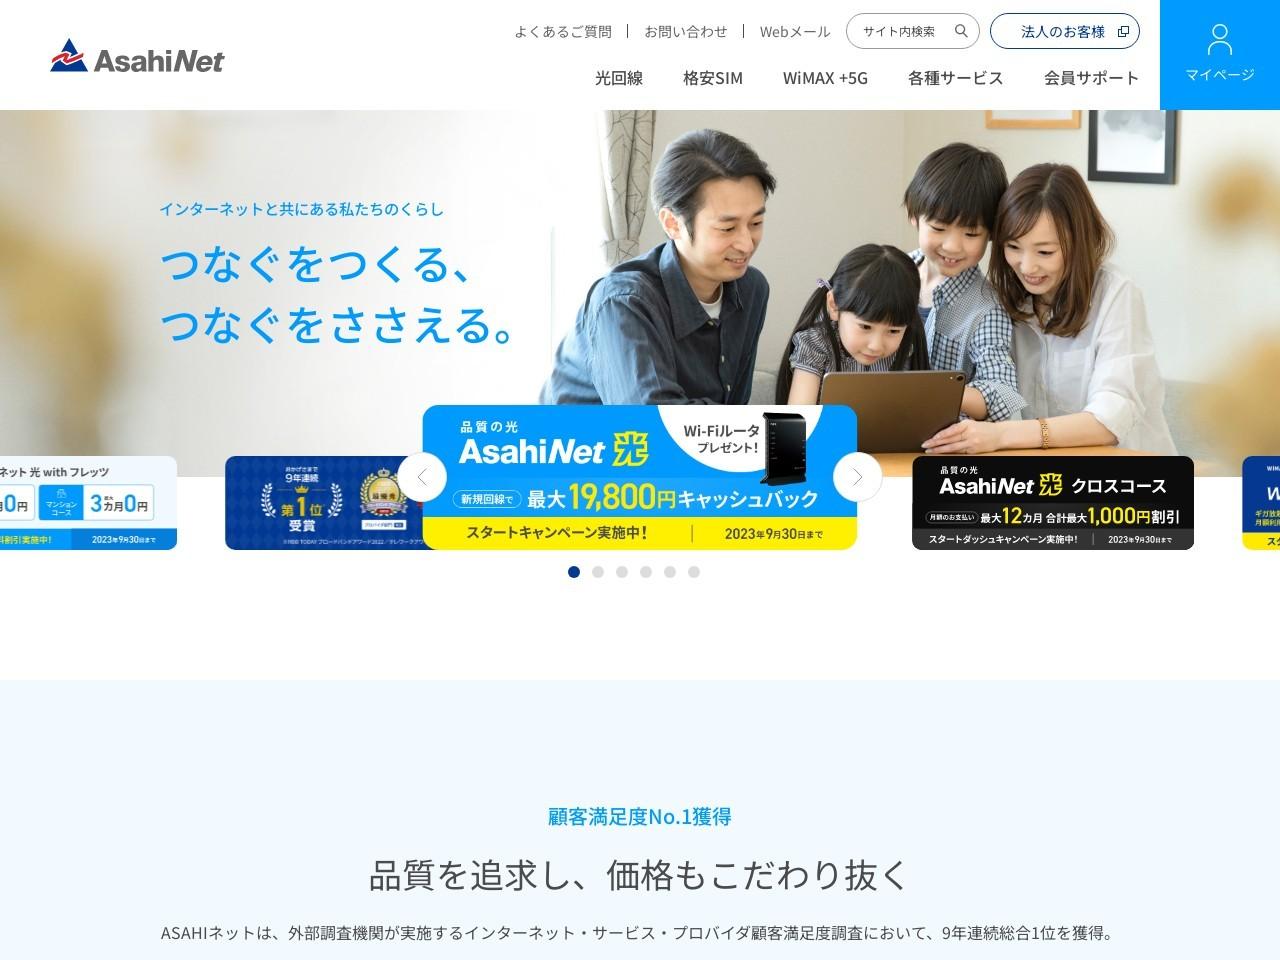 http%3A%2F%2Fwww.asahi net.or.jp%2F~UG6M KHT%2FPC%2FAMD RYZEN%2Fmother - 【自作PC】ASUS ROG X470-F STRIX、Ryzen 7の2000シリーズに最適なX470チップセット搭載マザー!